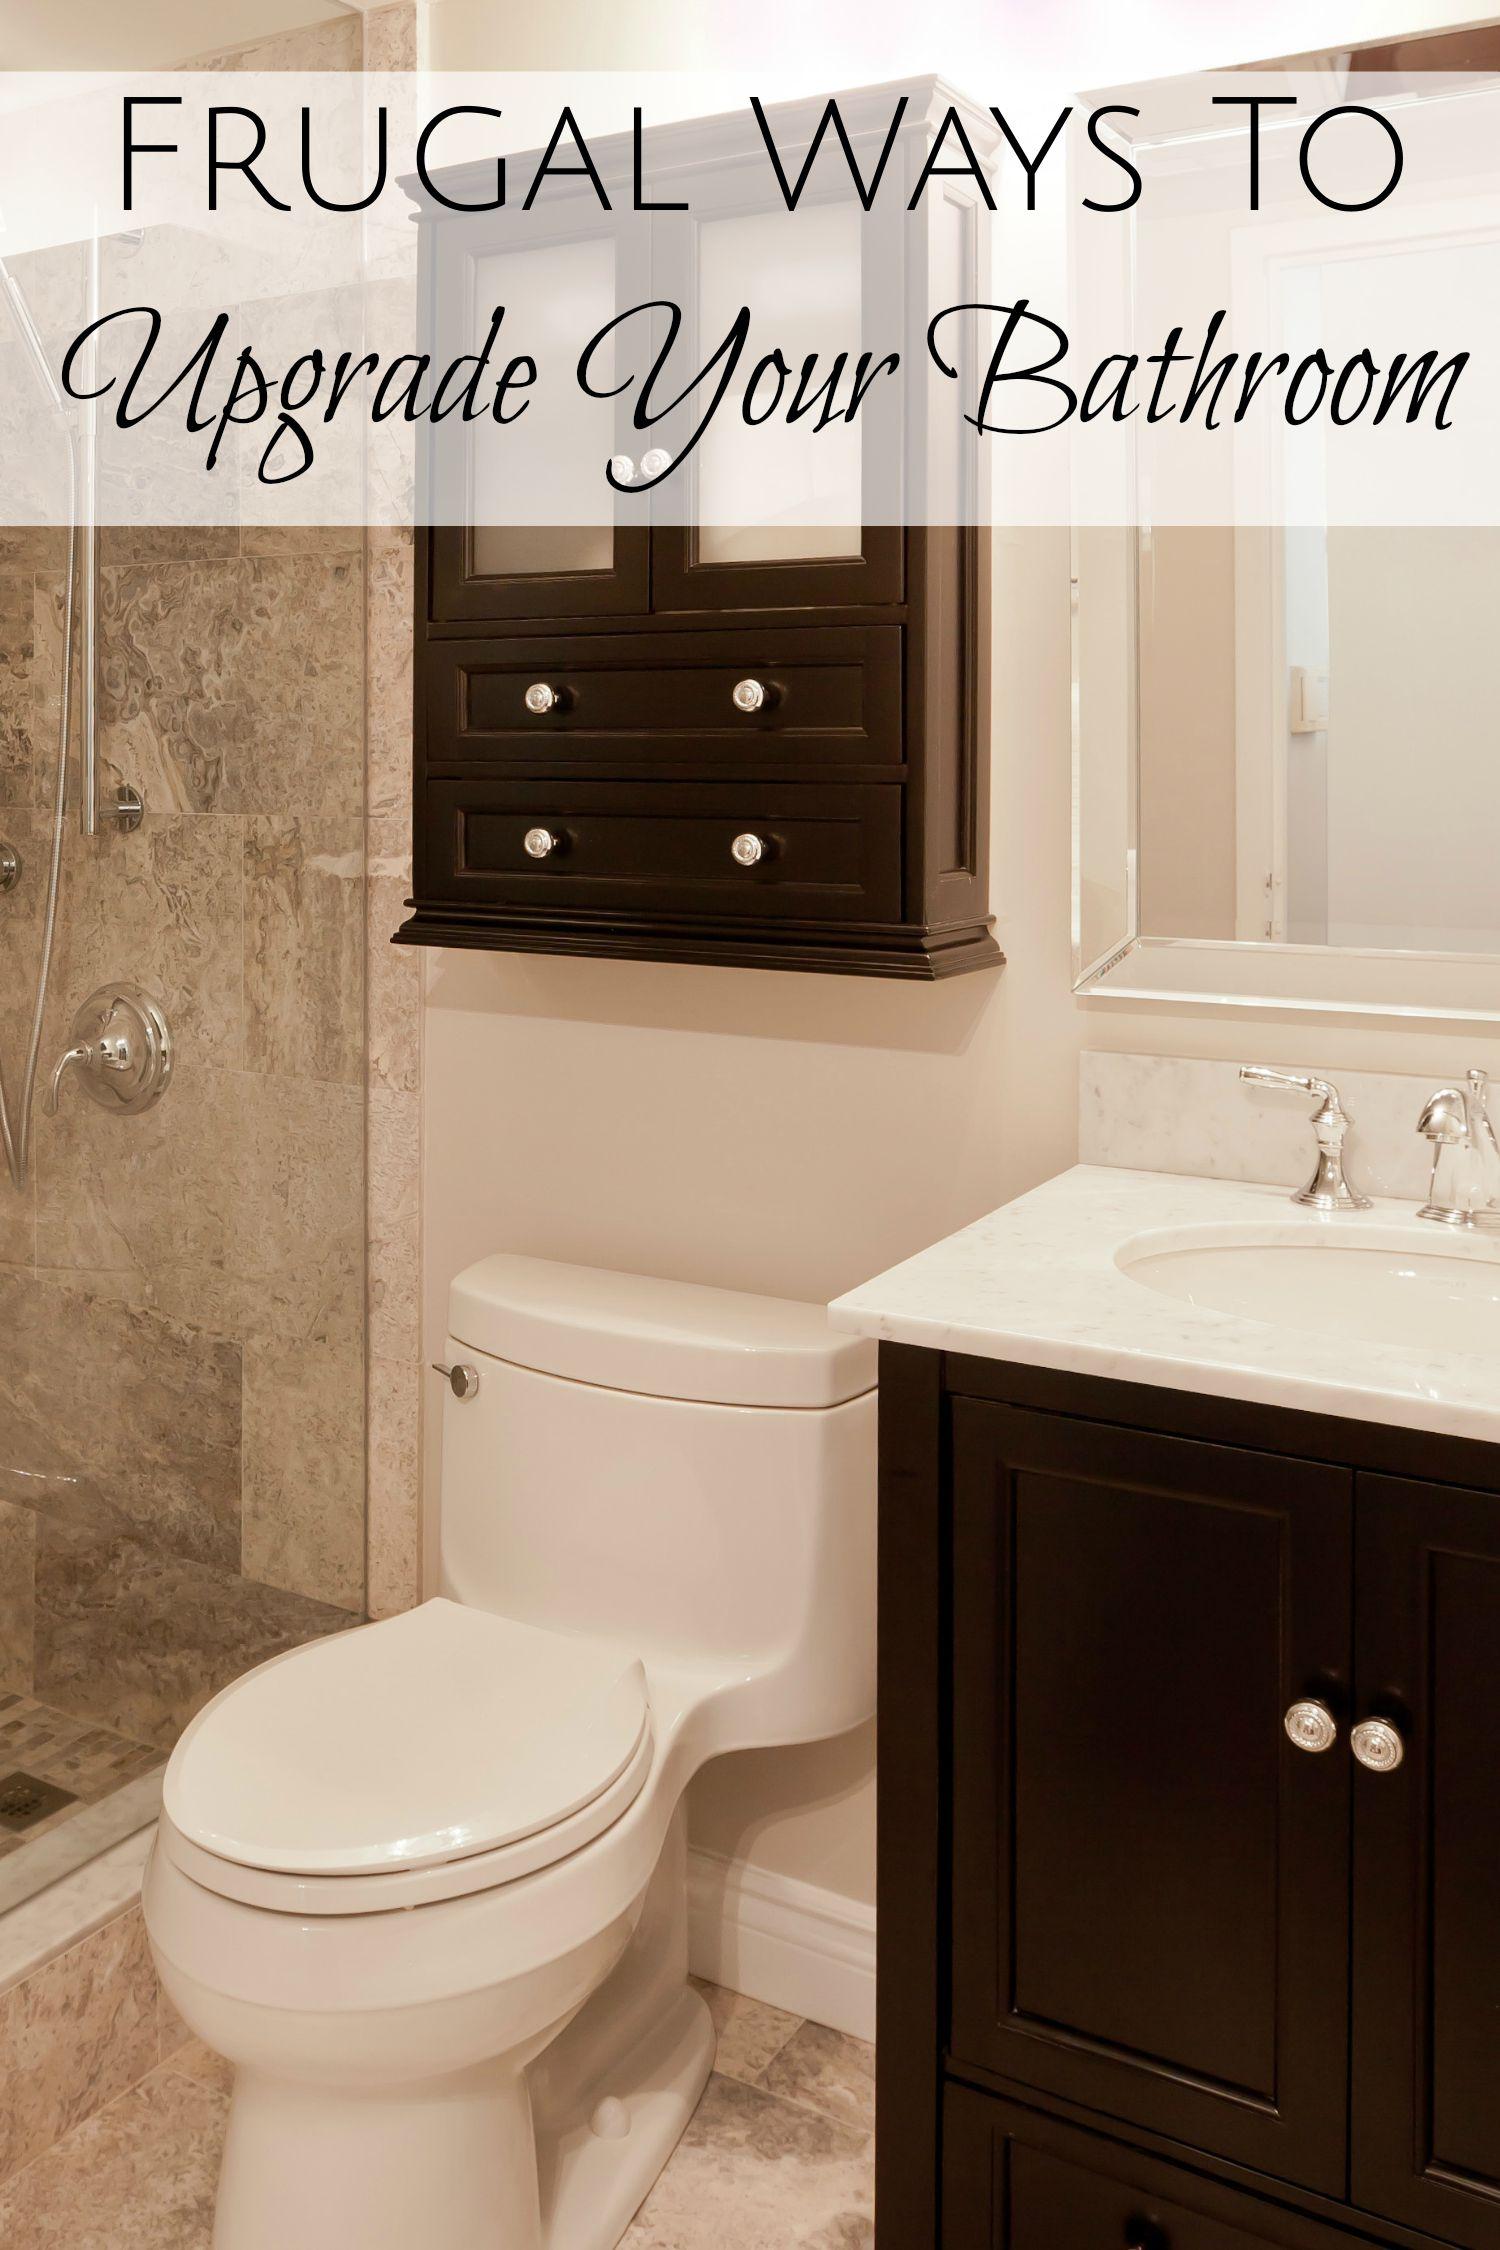 Frugal Ways To Upgrade Your Bathroom